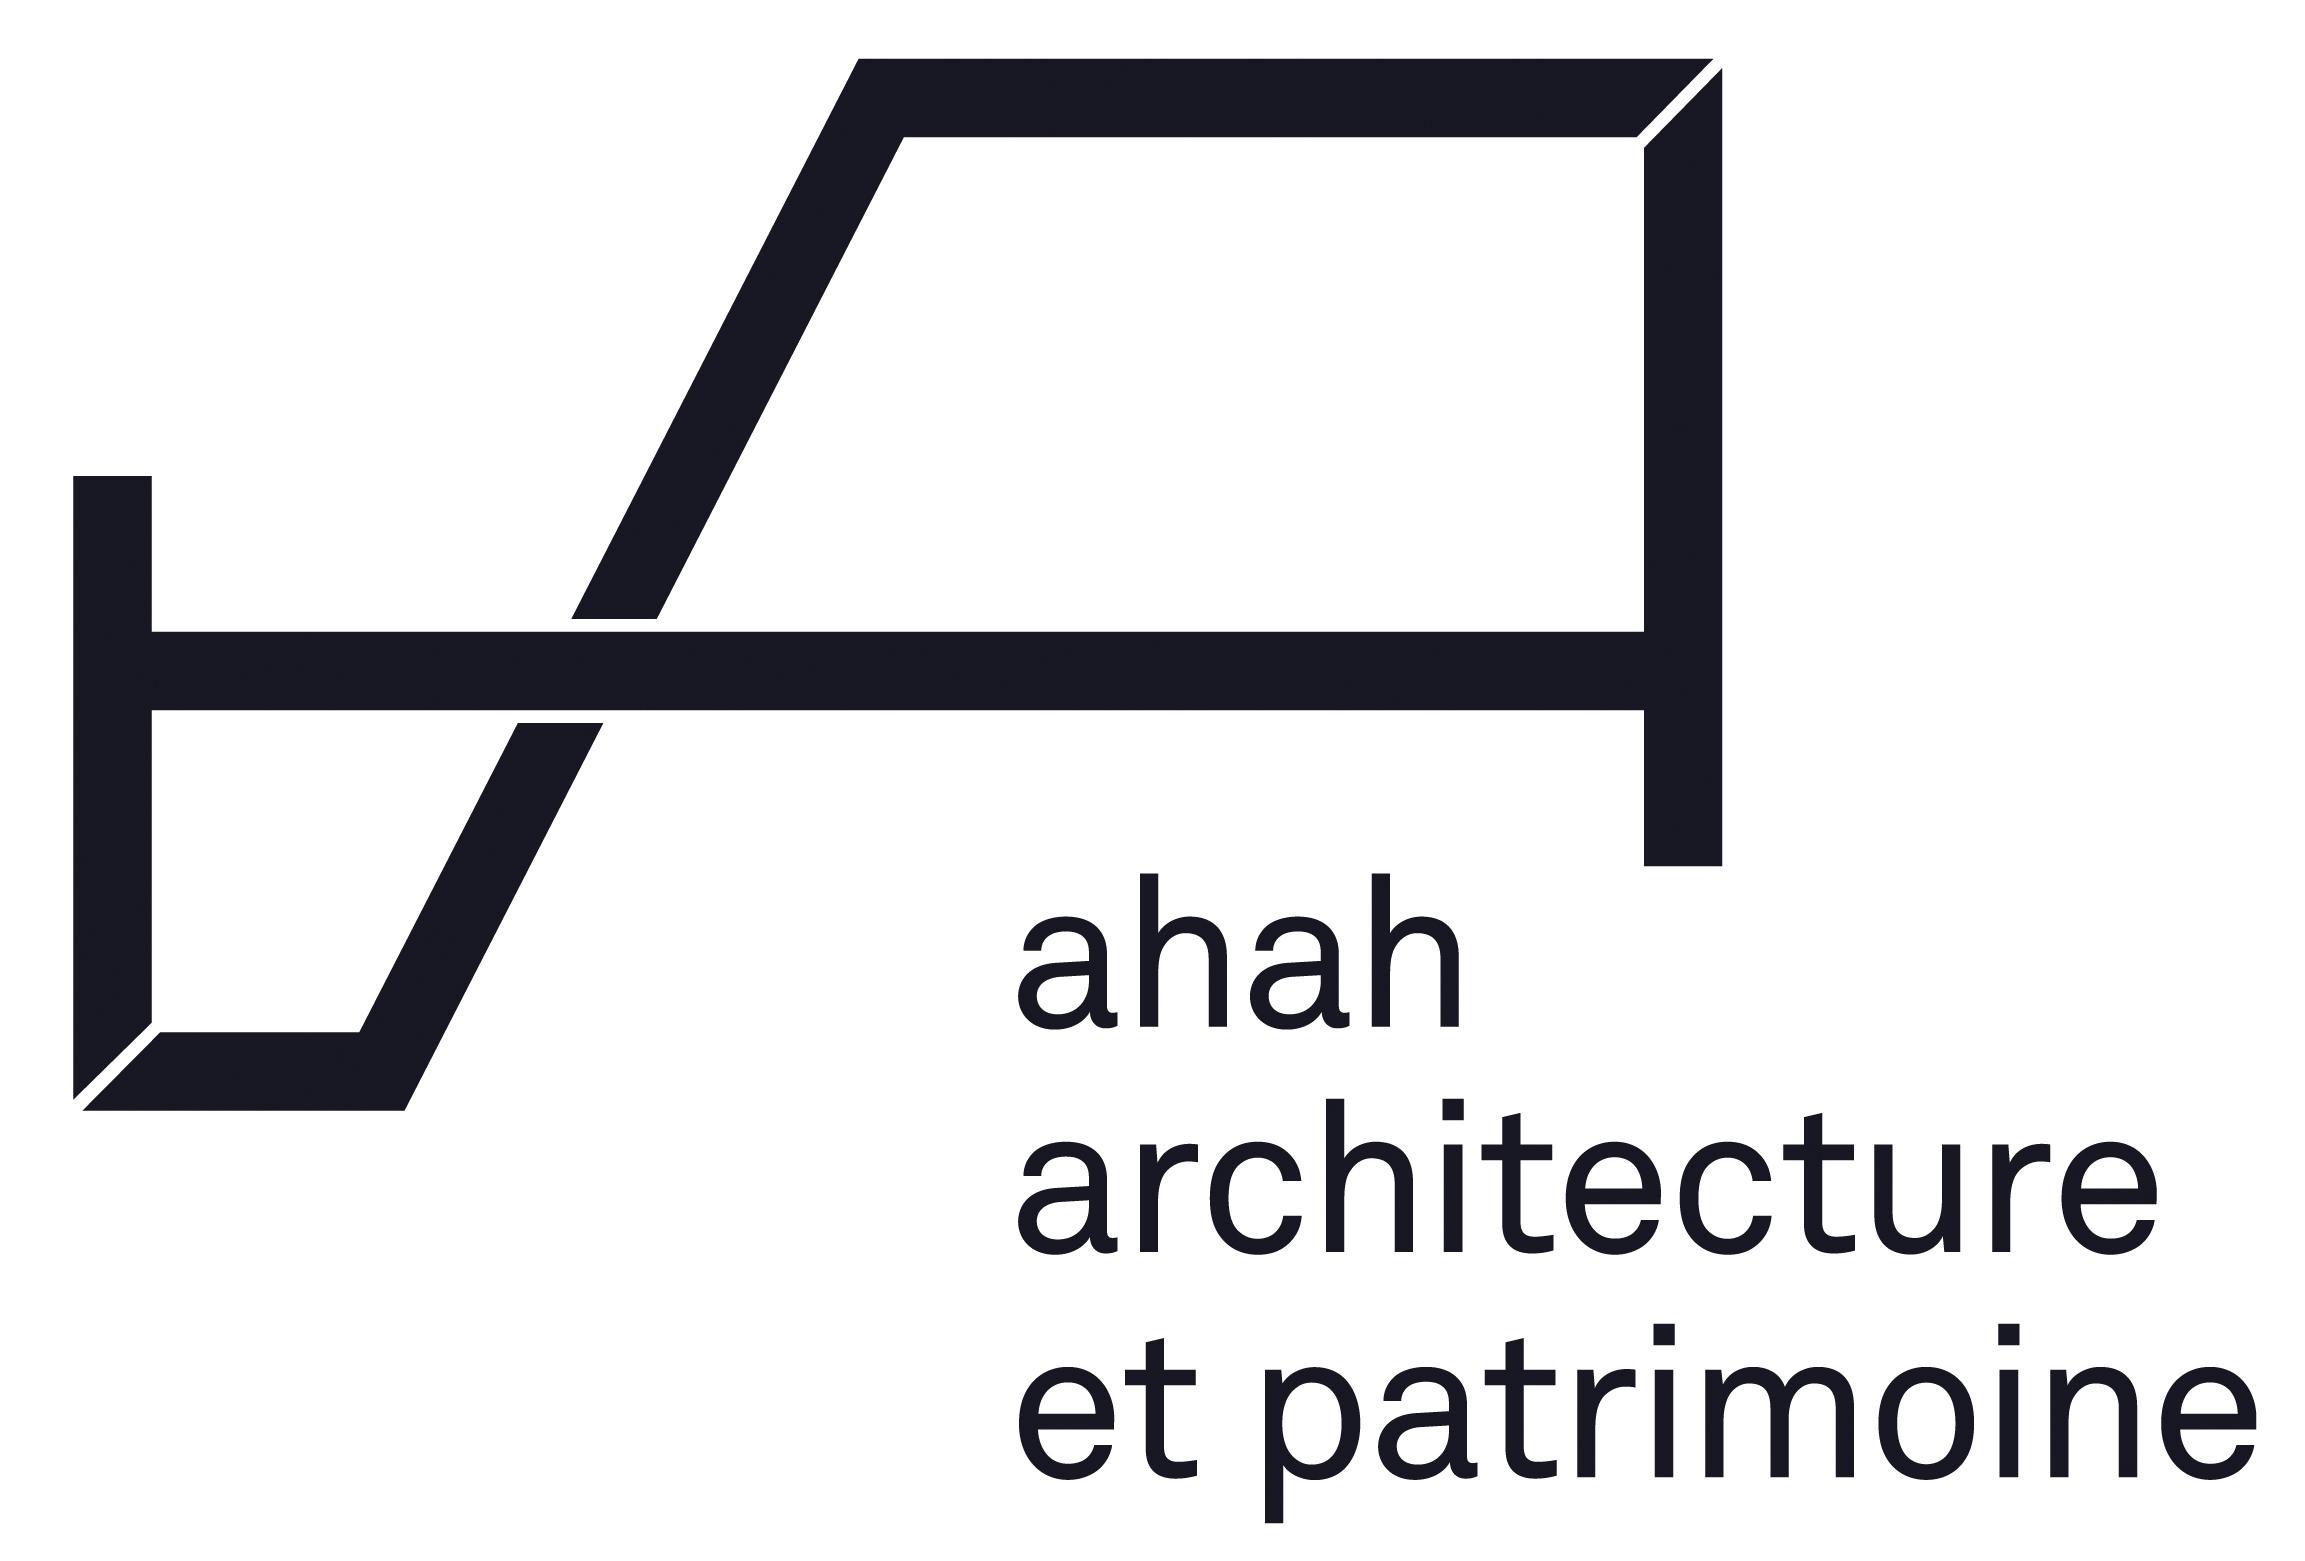 ahah architecture millery rh ne ordre des architectes. Black Bedroom Furniture Sets. Home Design Ideas